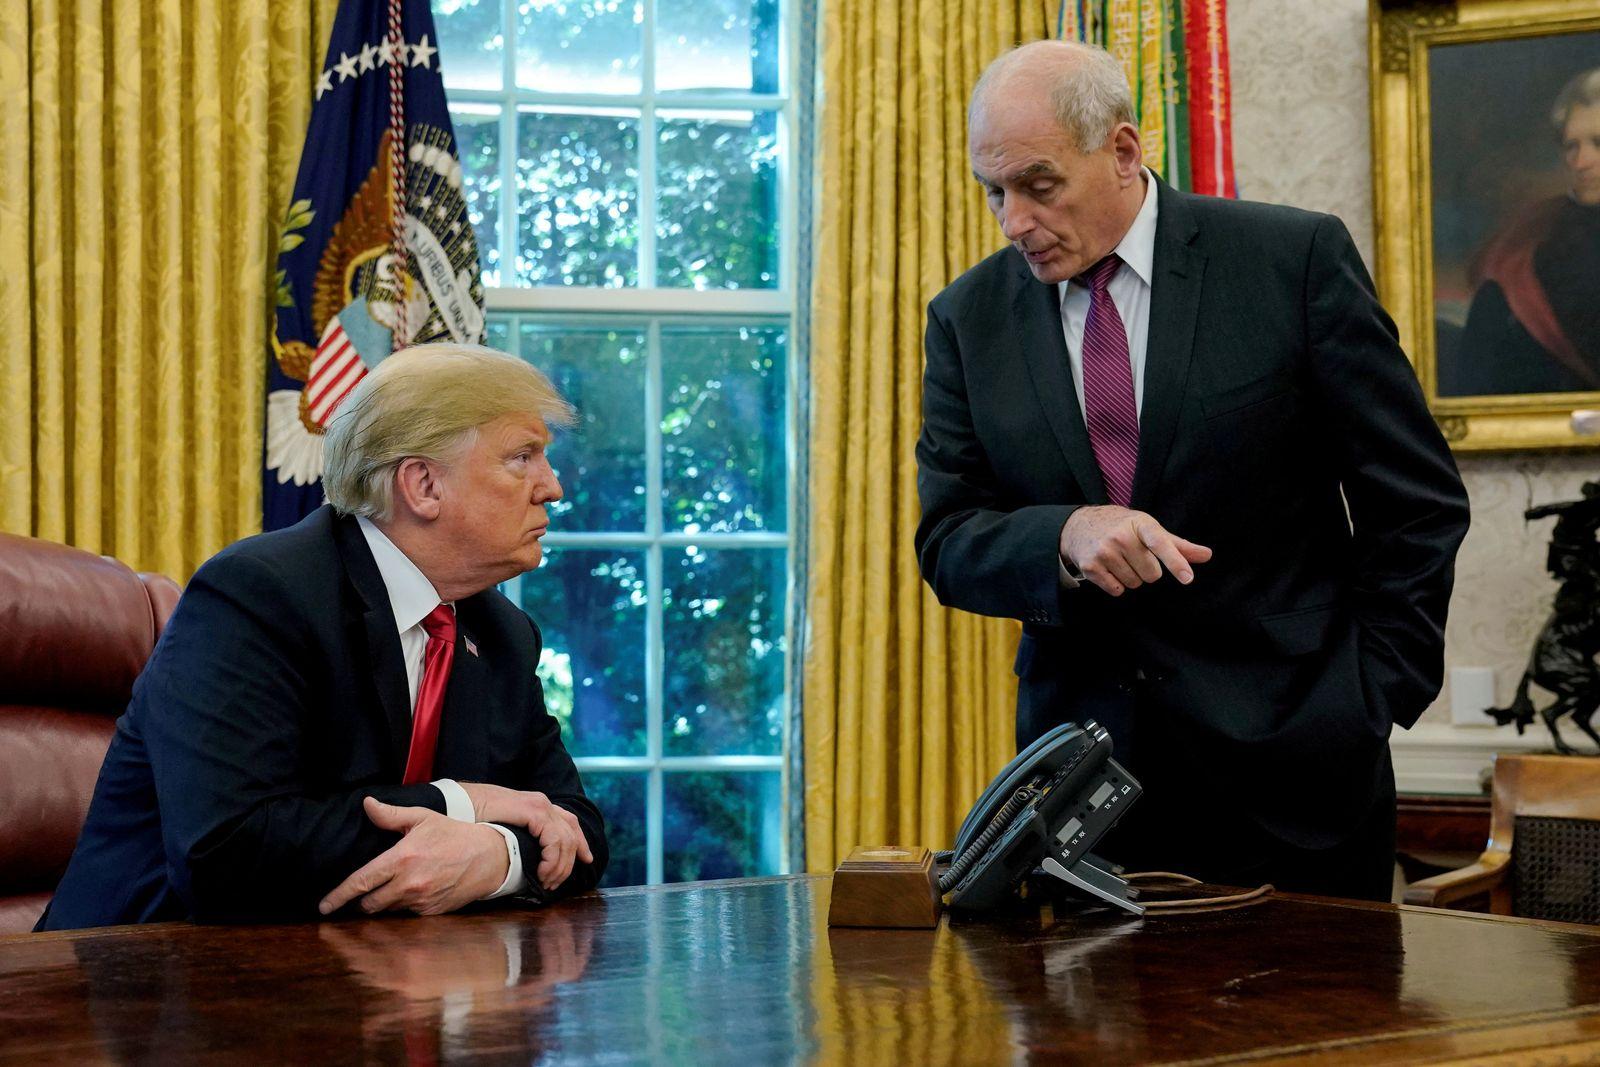 Trump Kelly